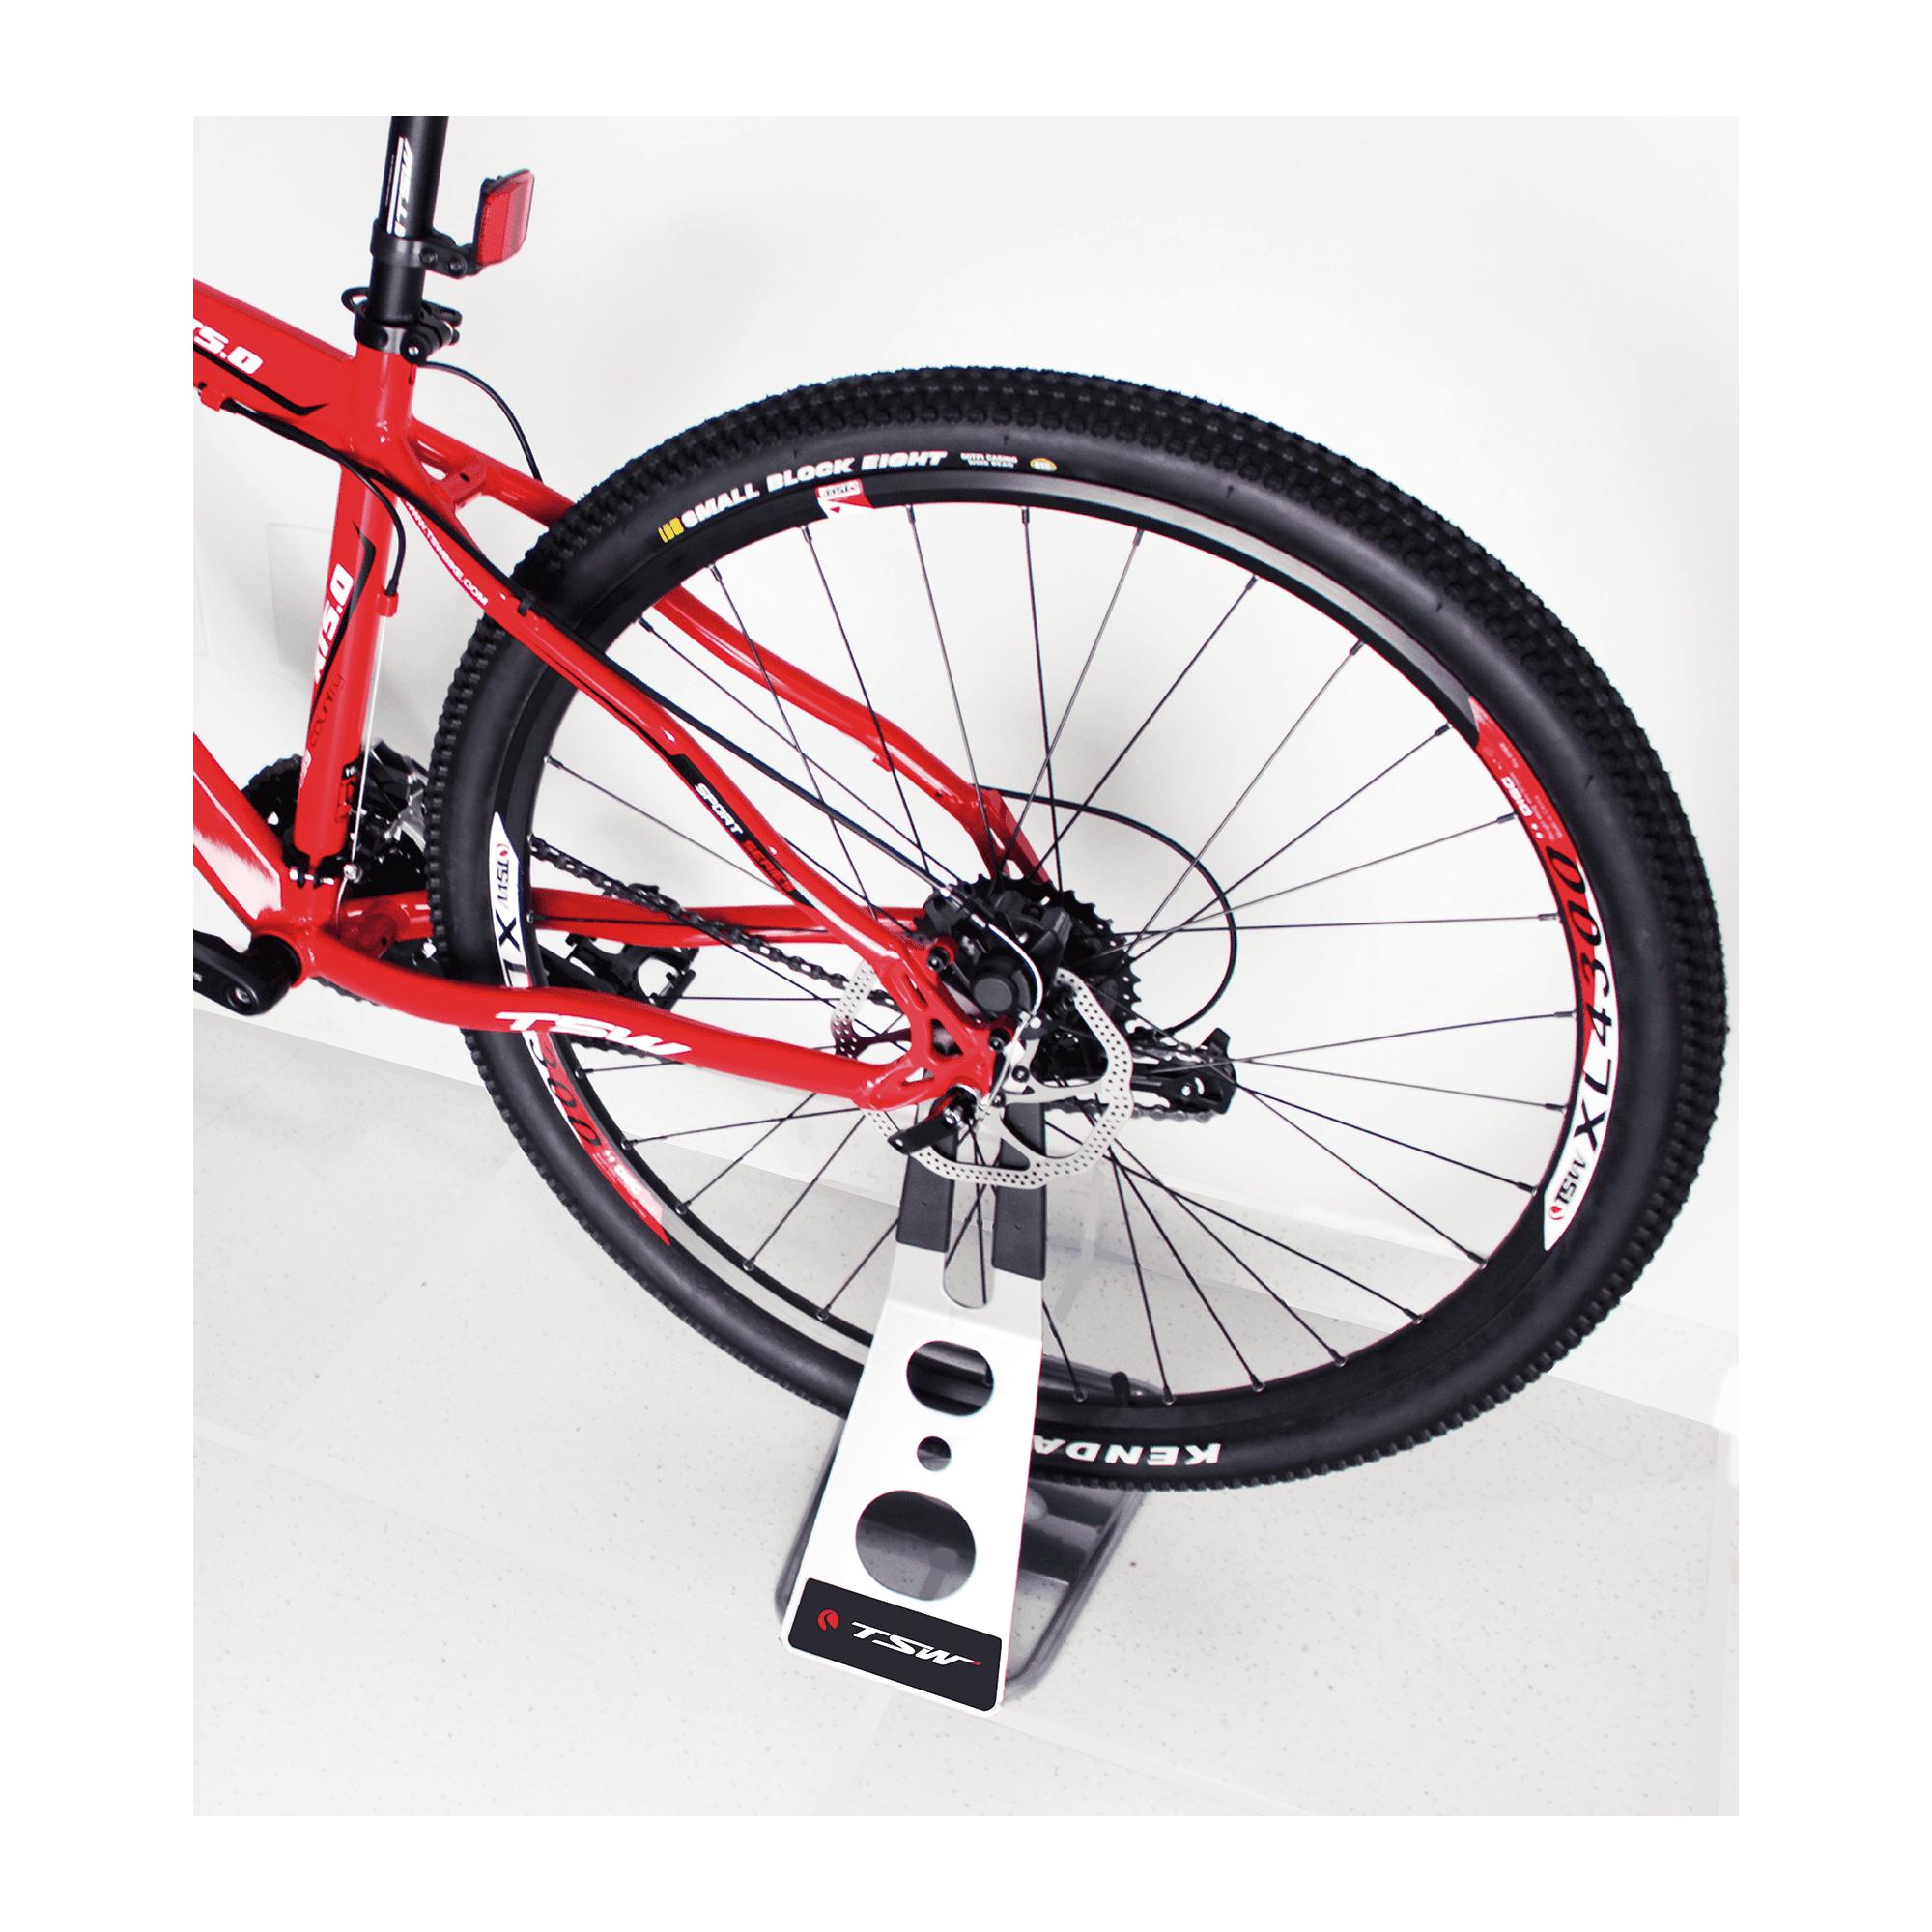 Suporte expositor para bicicleta 4